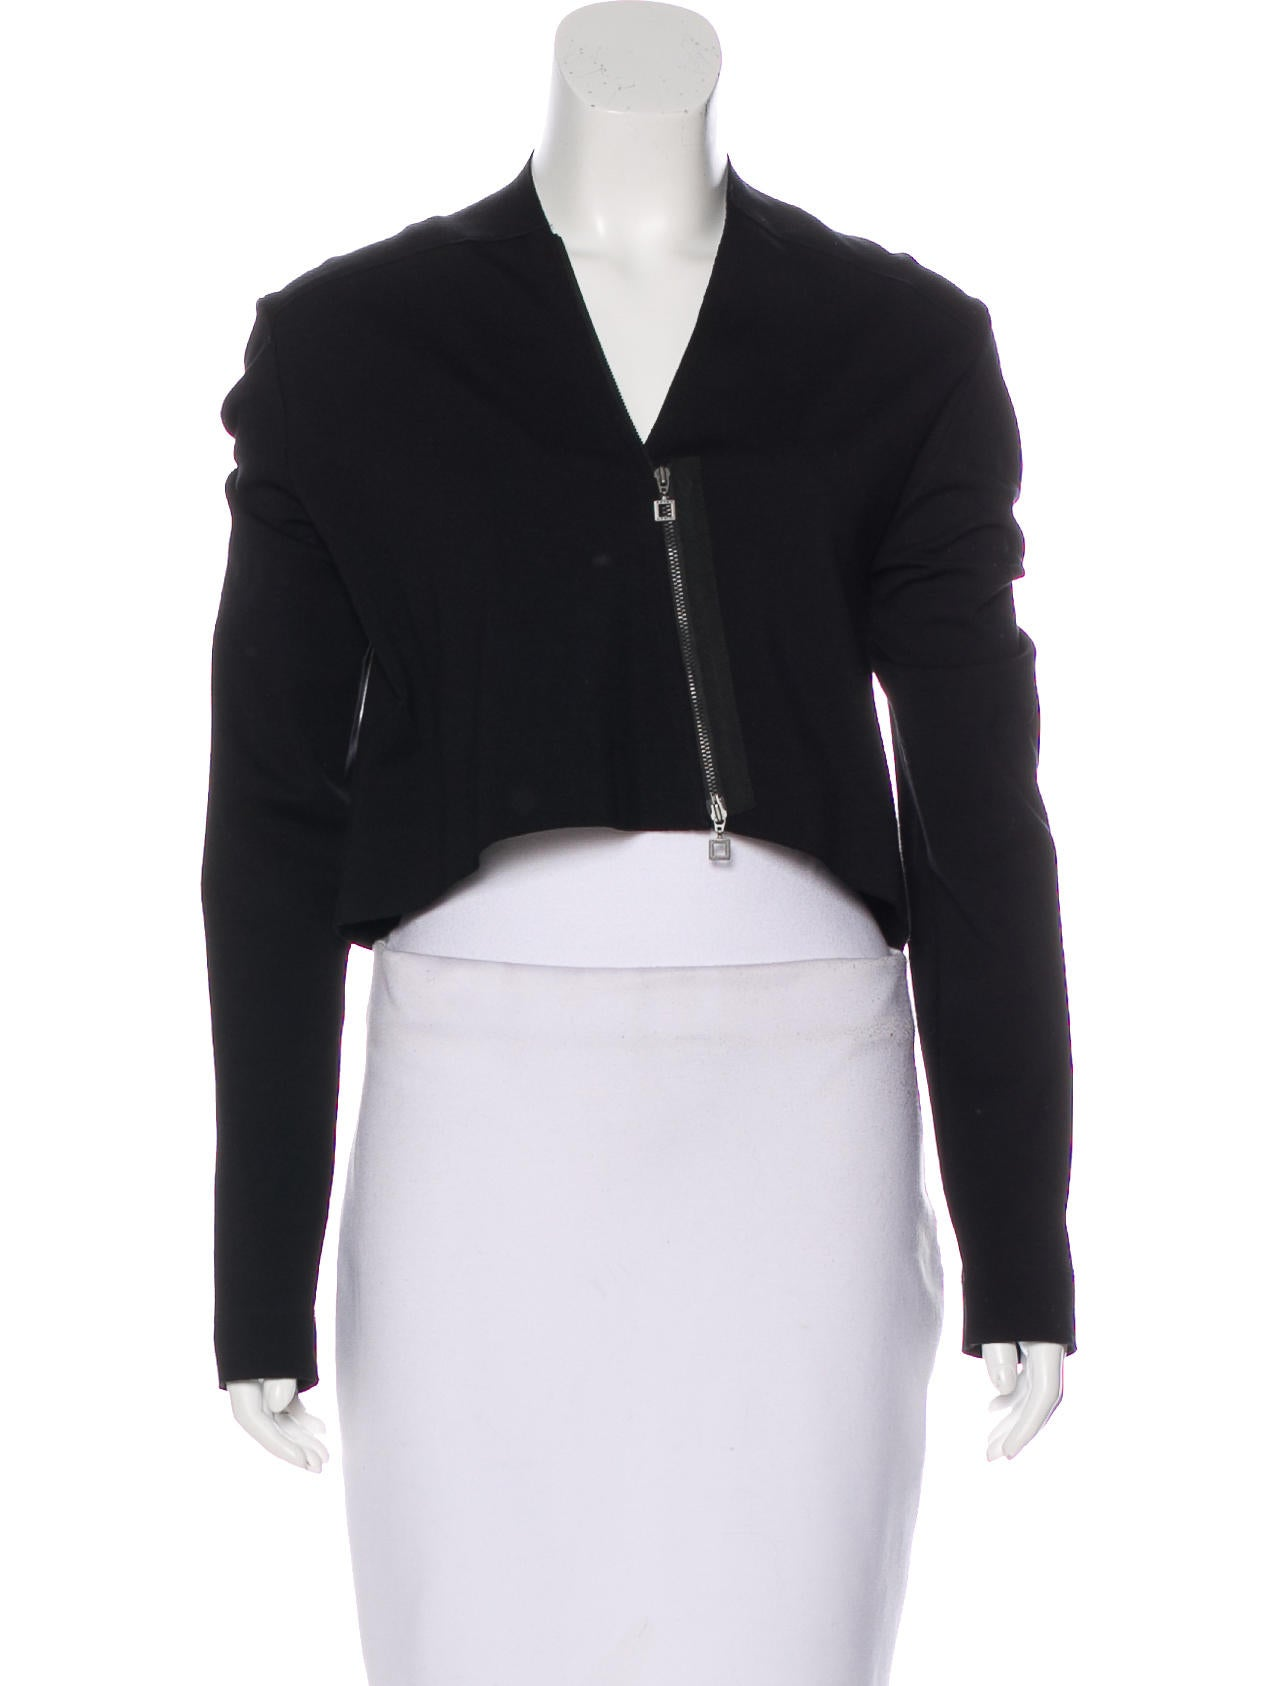 Sarah Pacini Cropped Zip Up Sweater Clothing Wsarp20109 The